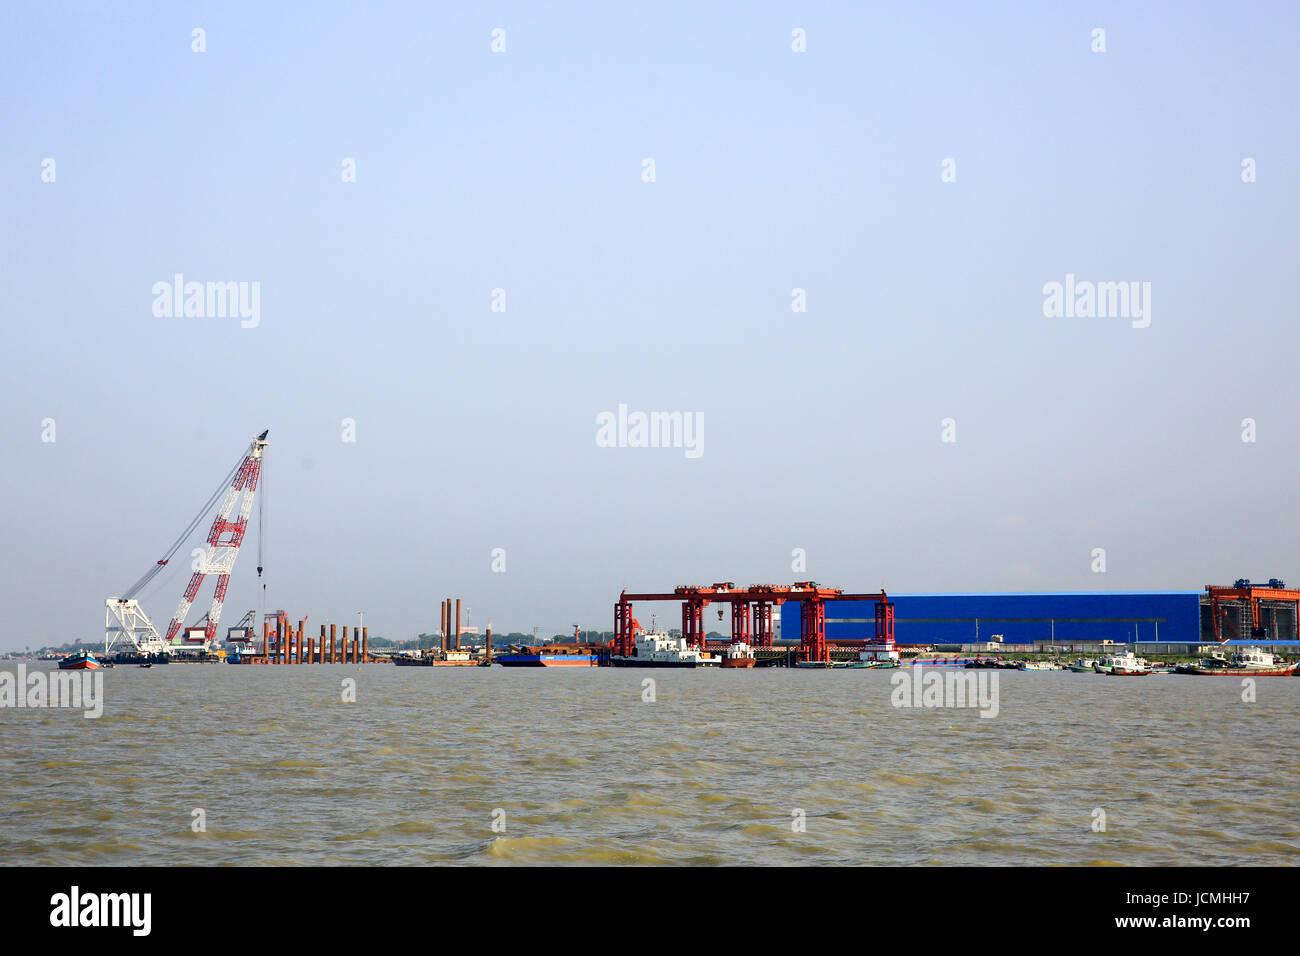 Bridge construction work in progress on the Padma River. Bangladesh - Stock Image